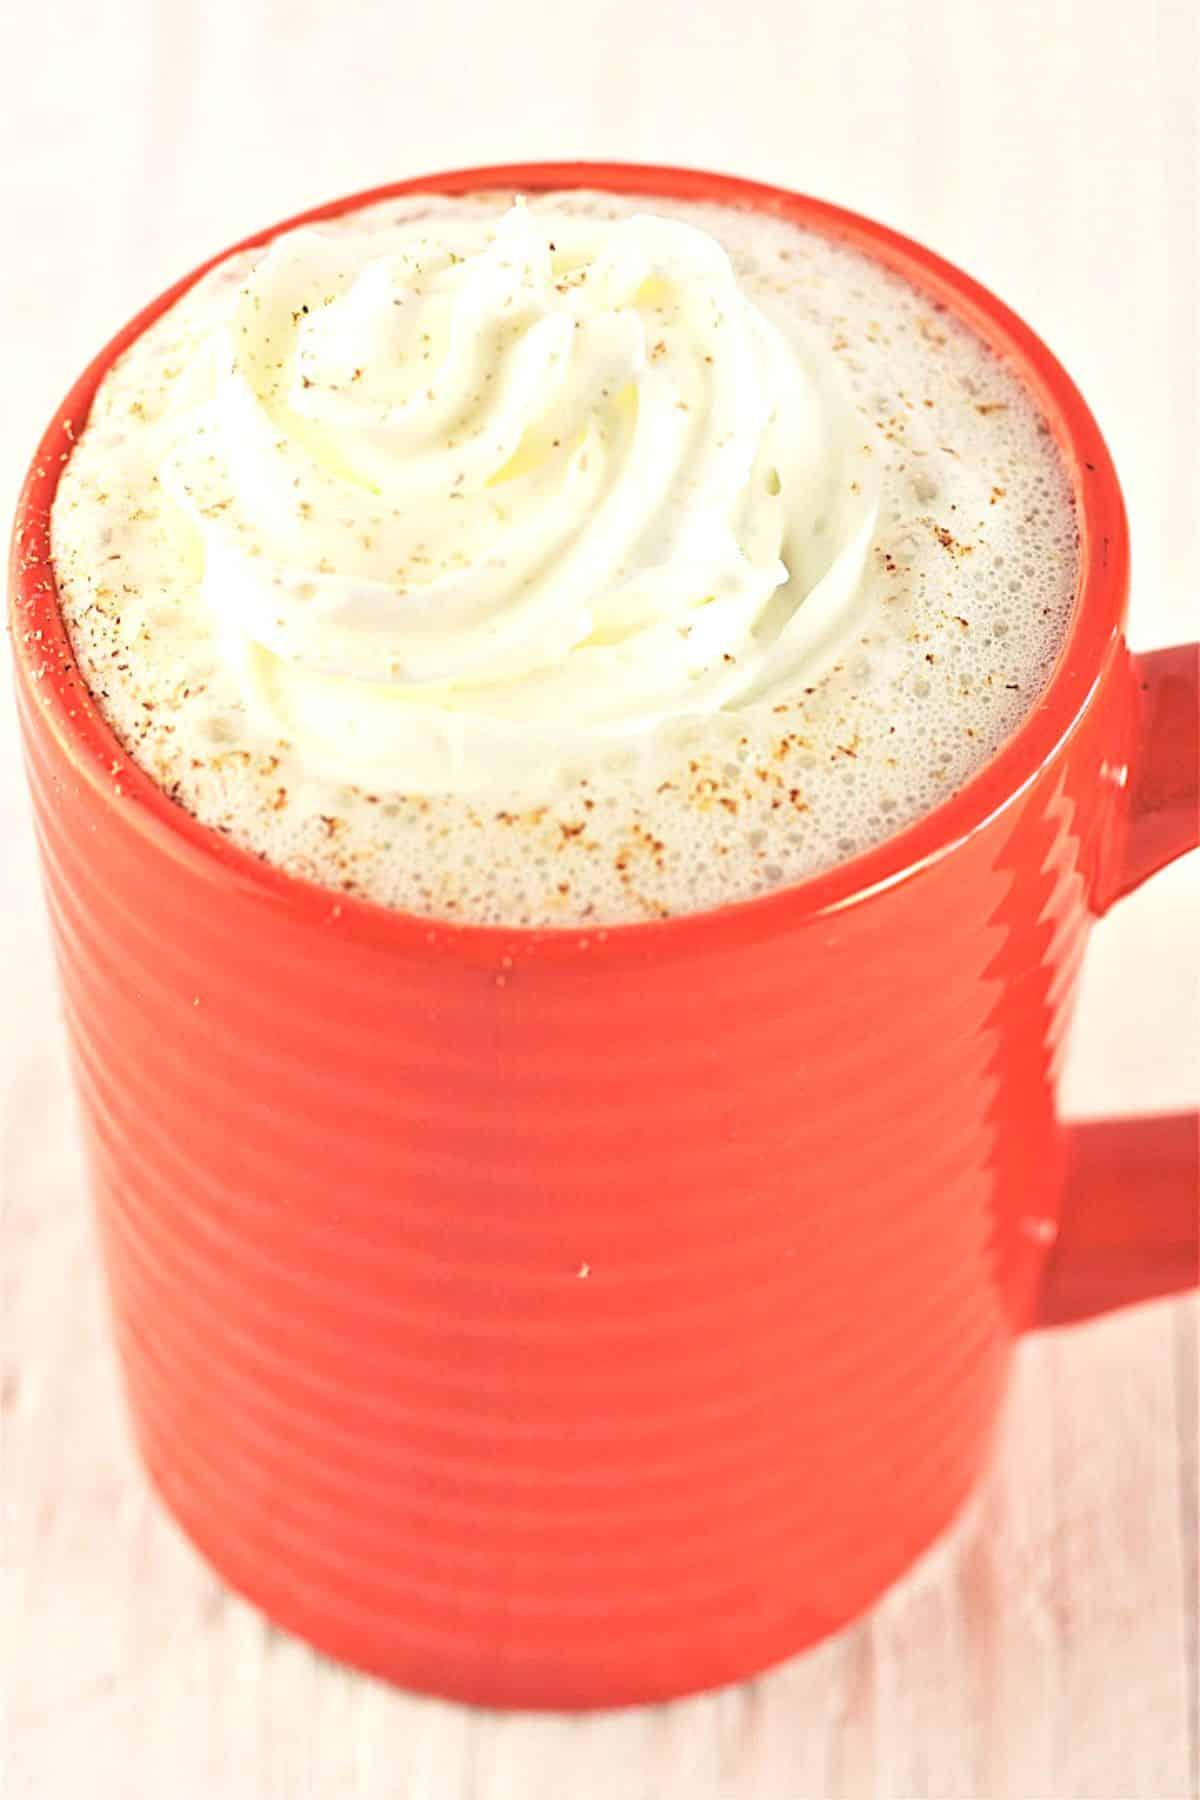 orange mug of warm vanilla milk bedtime drink with whipped cream and nutmeg